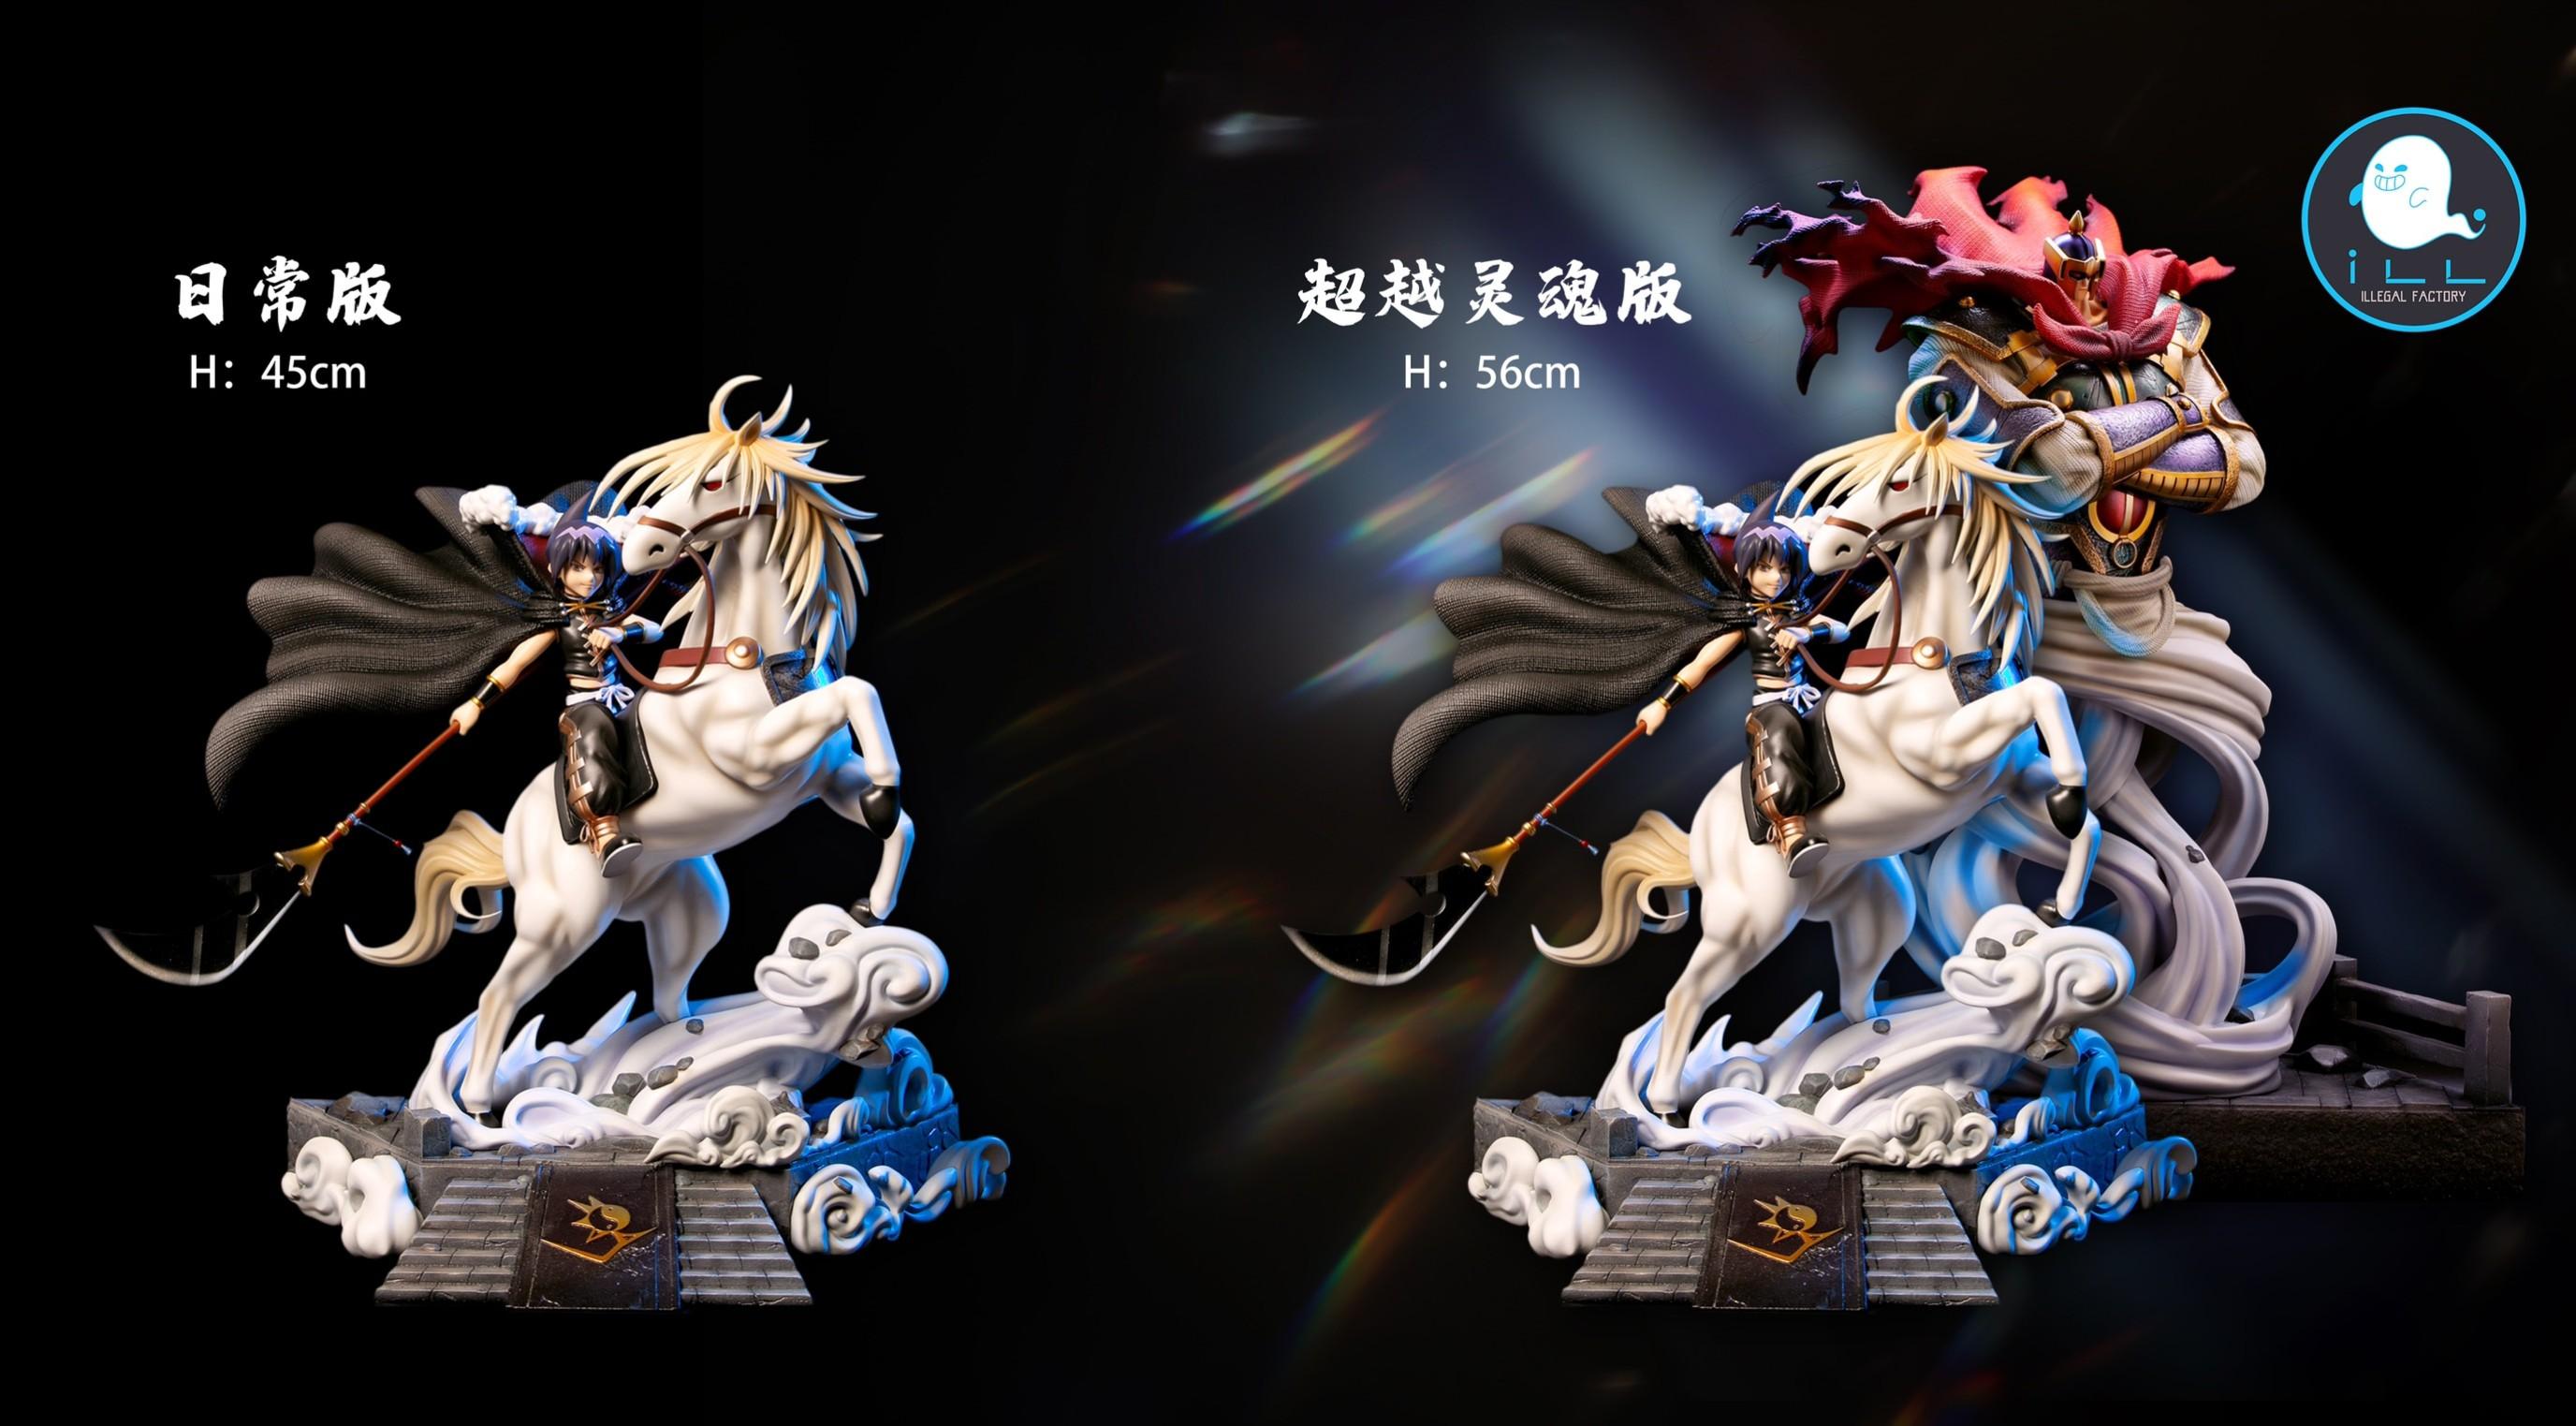 Deluxe Tao Ren เต๋าเร็น iLL Factory (มัดจำ)